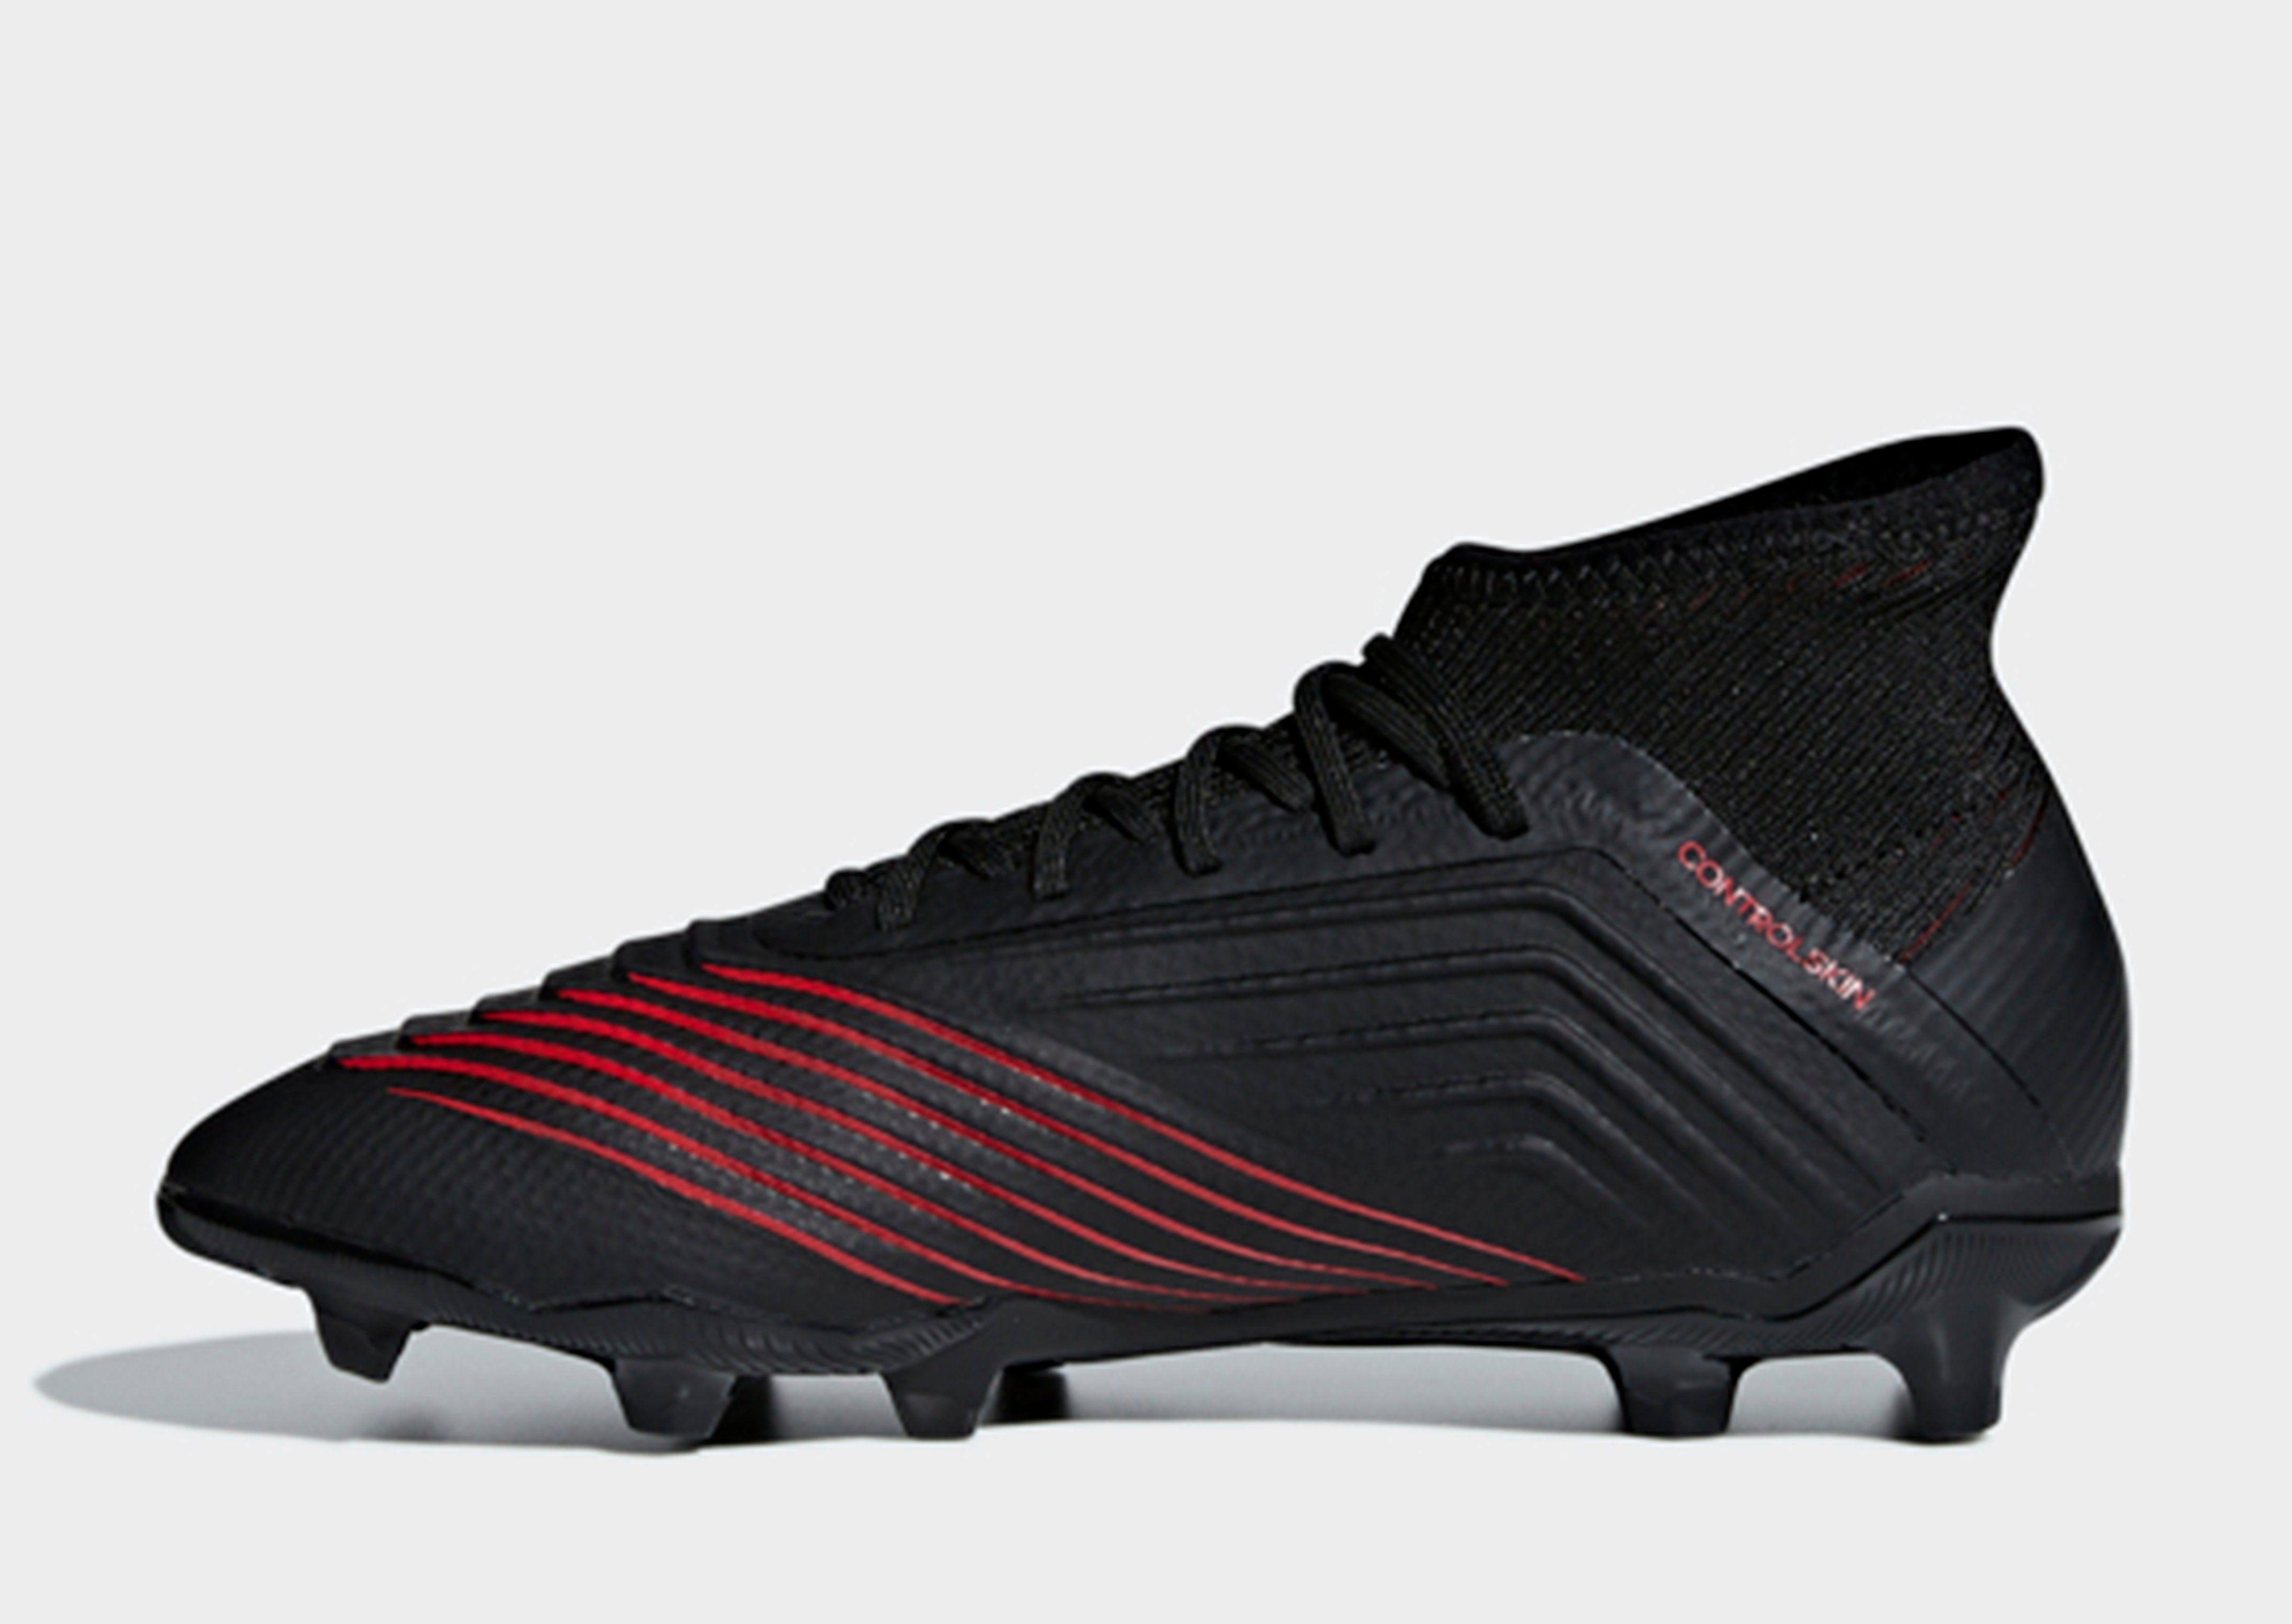 8d7aab8c4d4 adidas Performance Predator 19.1 Firm Ground Boots | JD Sports